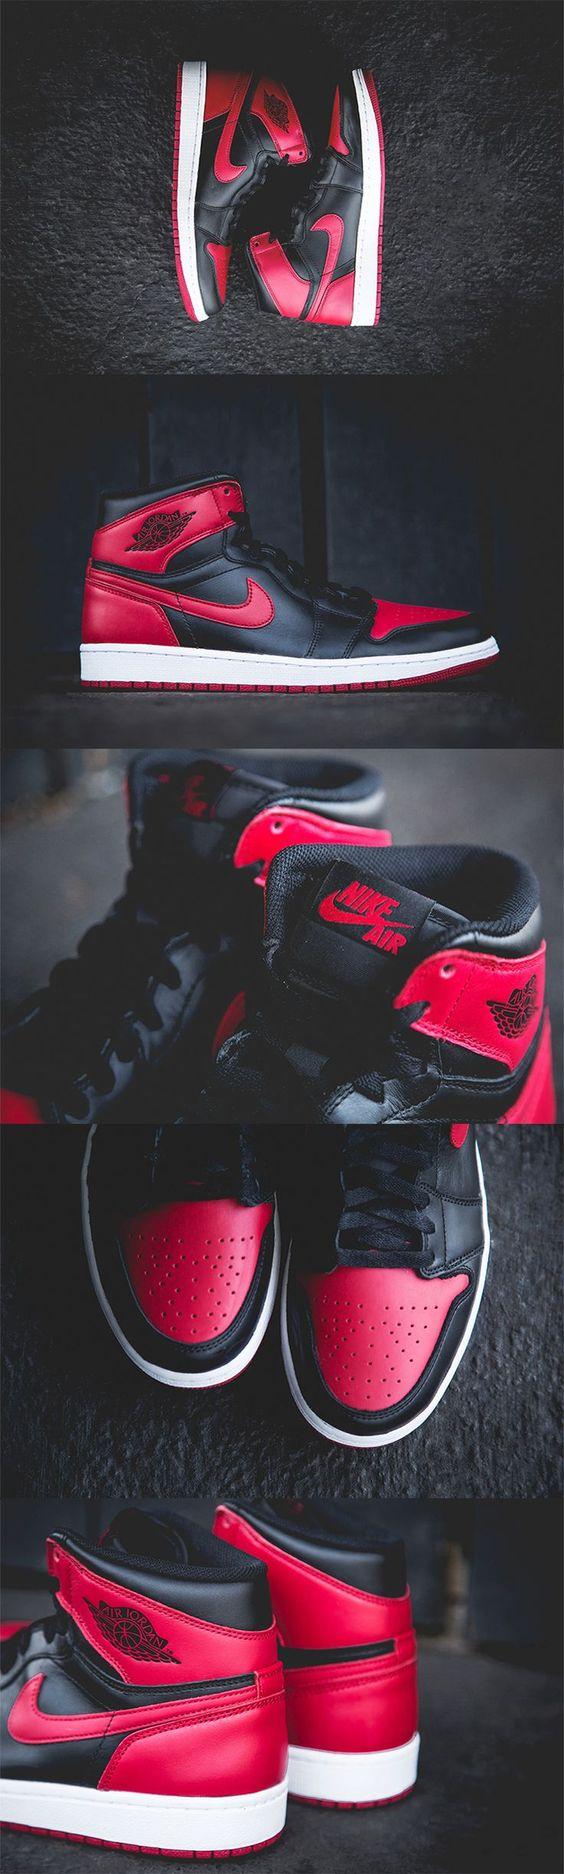 site de chaussure jordan pas cher - Air Jordan 1 Retro - ��Bred�� New Hip Hop Beats Uploaded EVERY ...